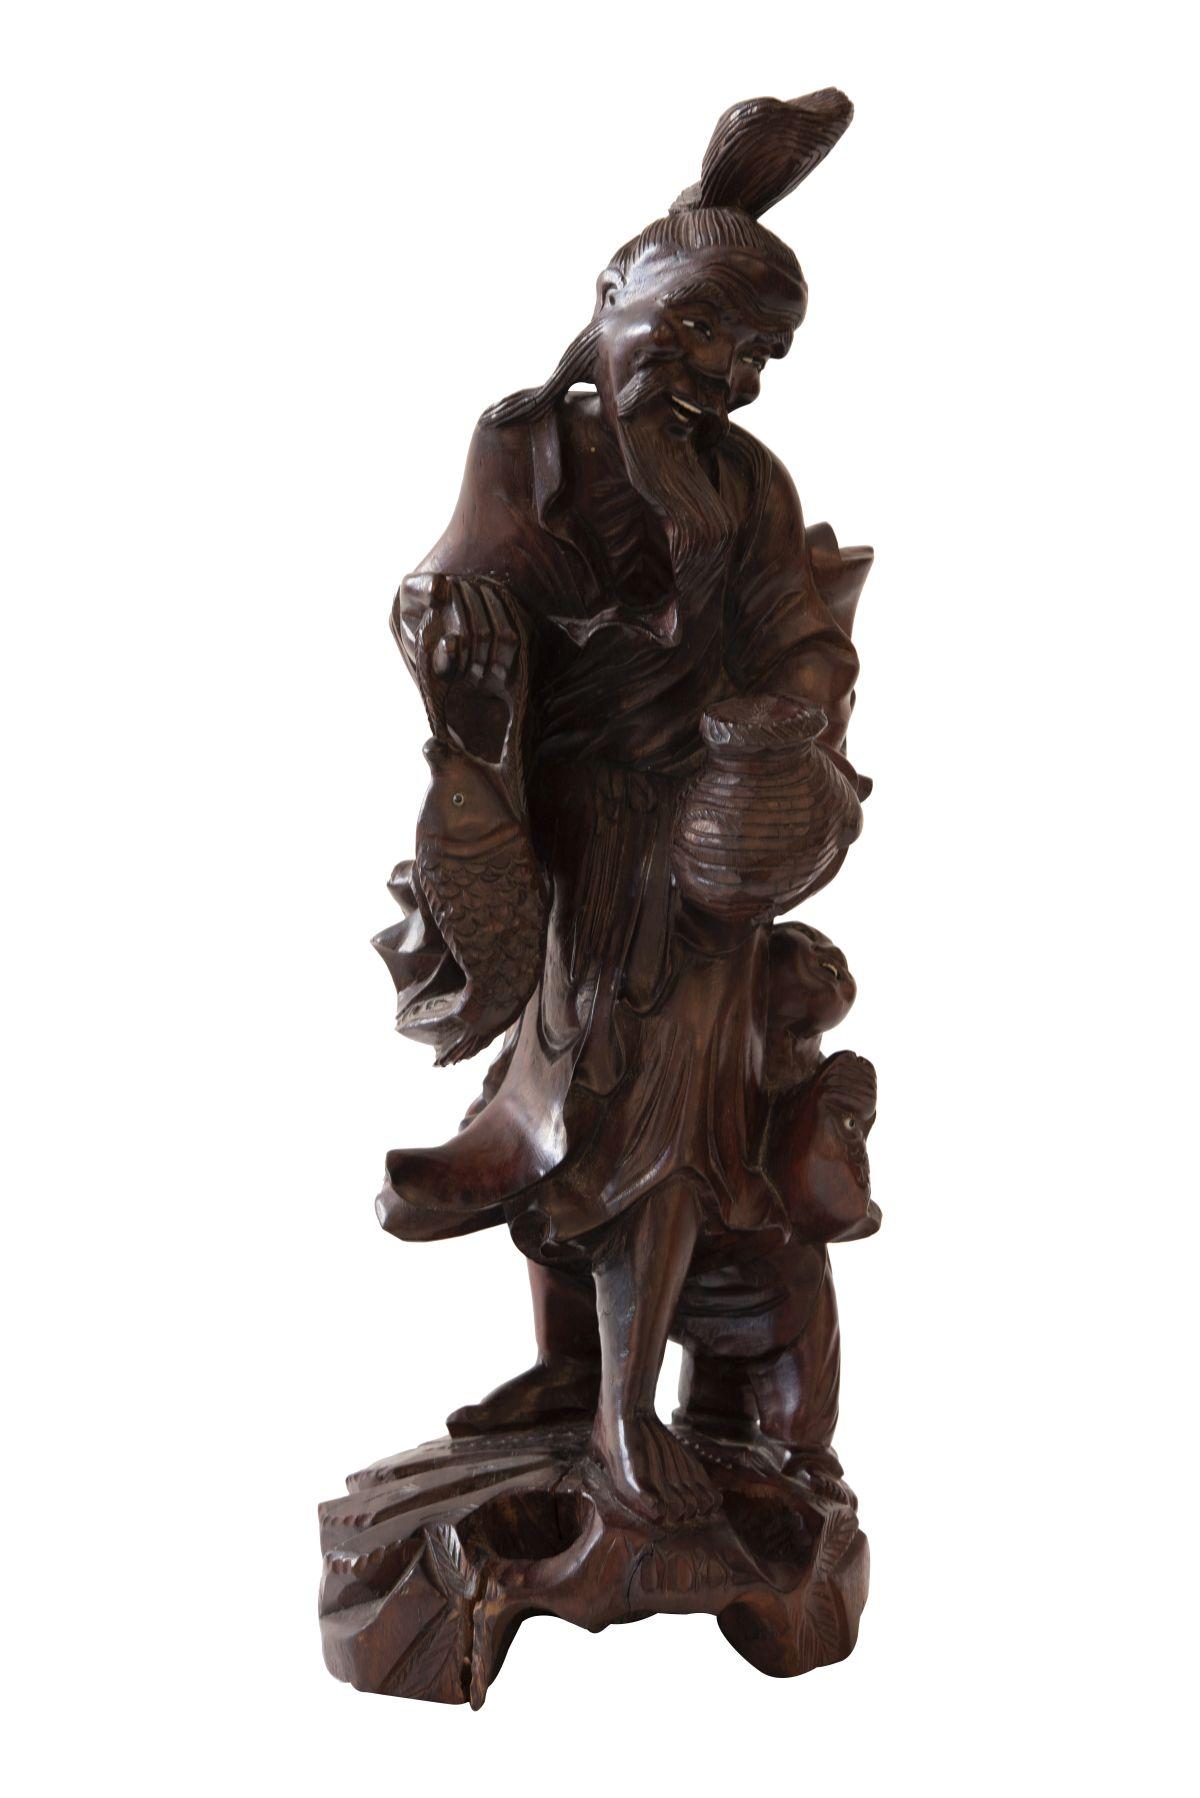 #32 Chinese wooden figure | Chinesische Holzfigur Image